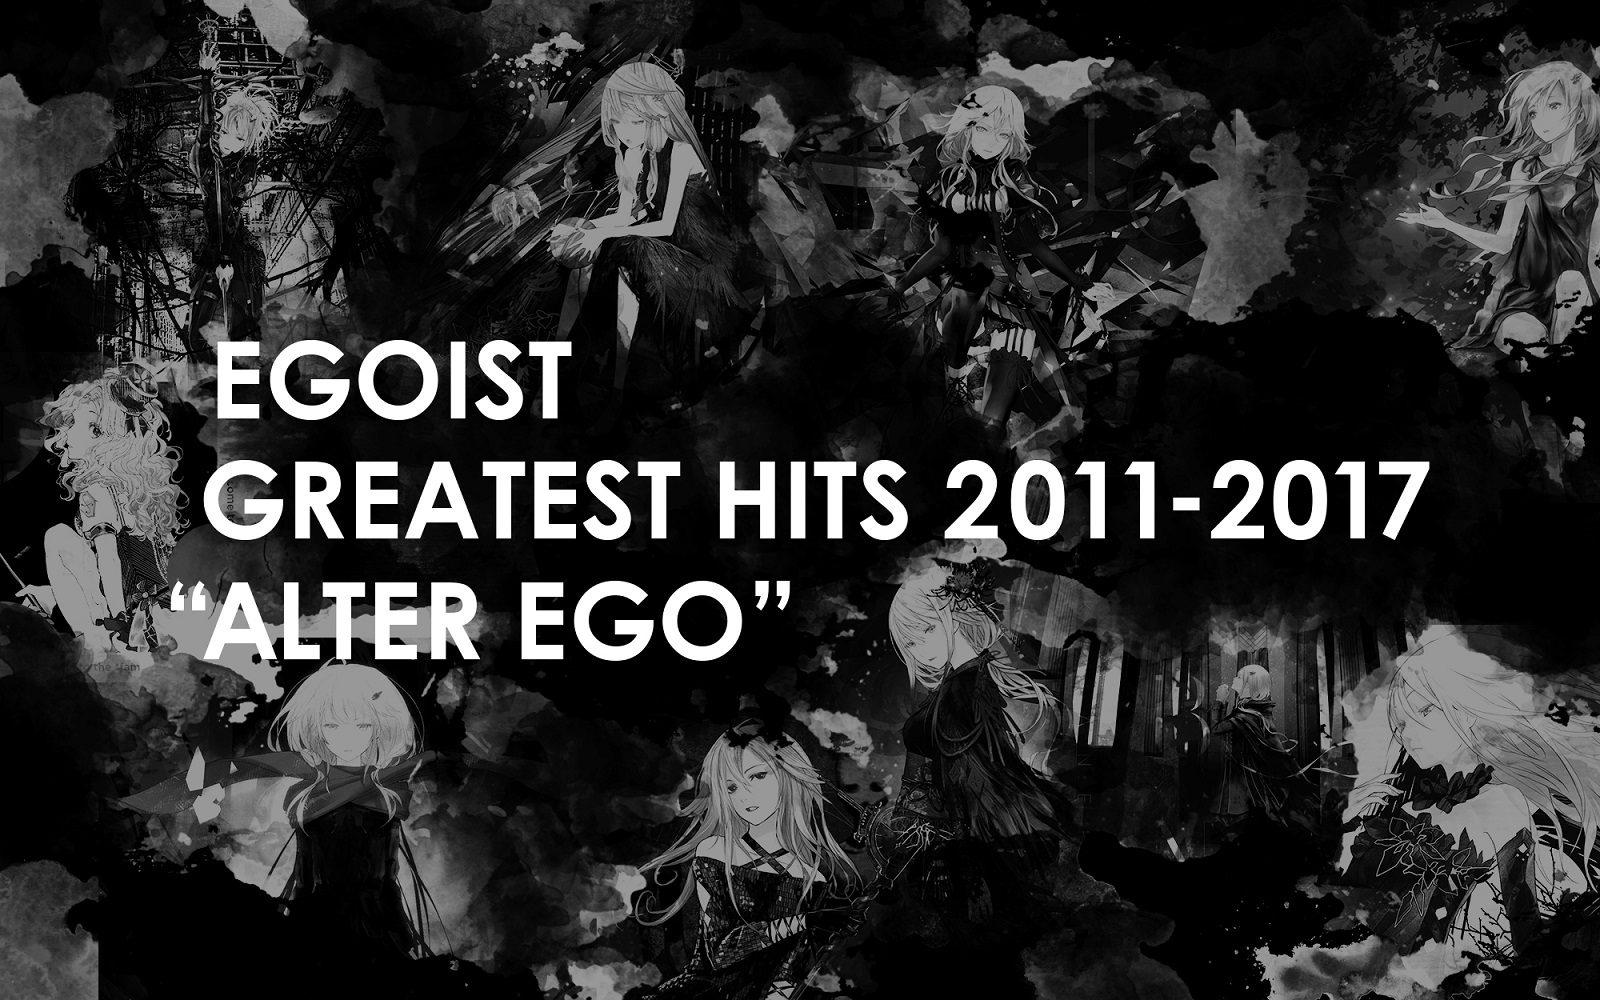 EGOIST 初のBEST ALBUMを12月27日(水)リリース!年末にはスペシャルライブも開催サムネイル画像